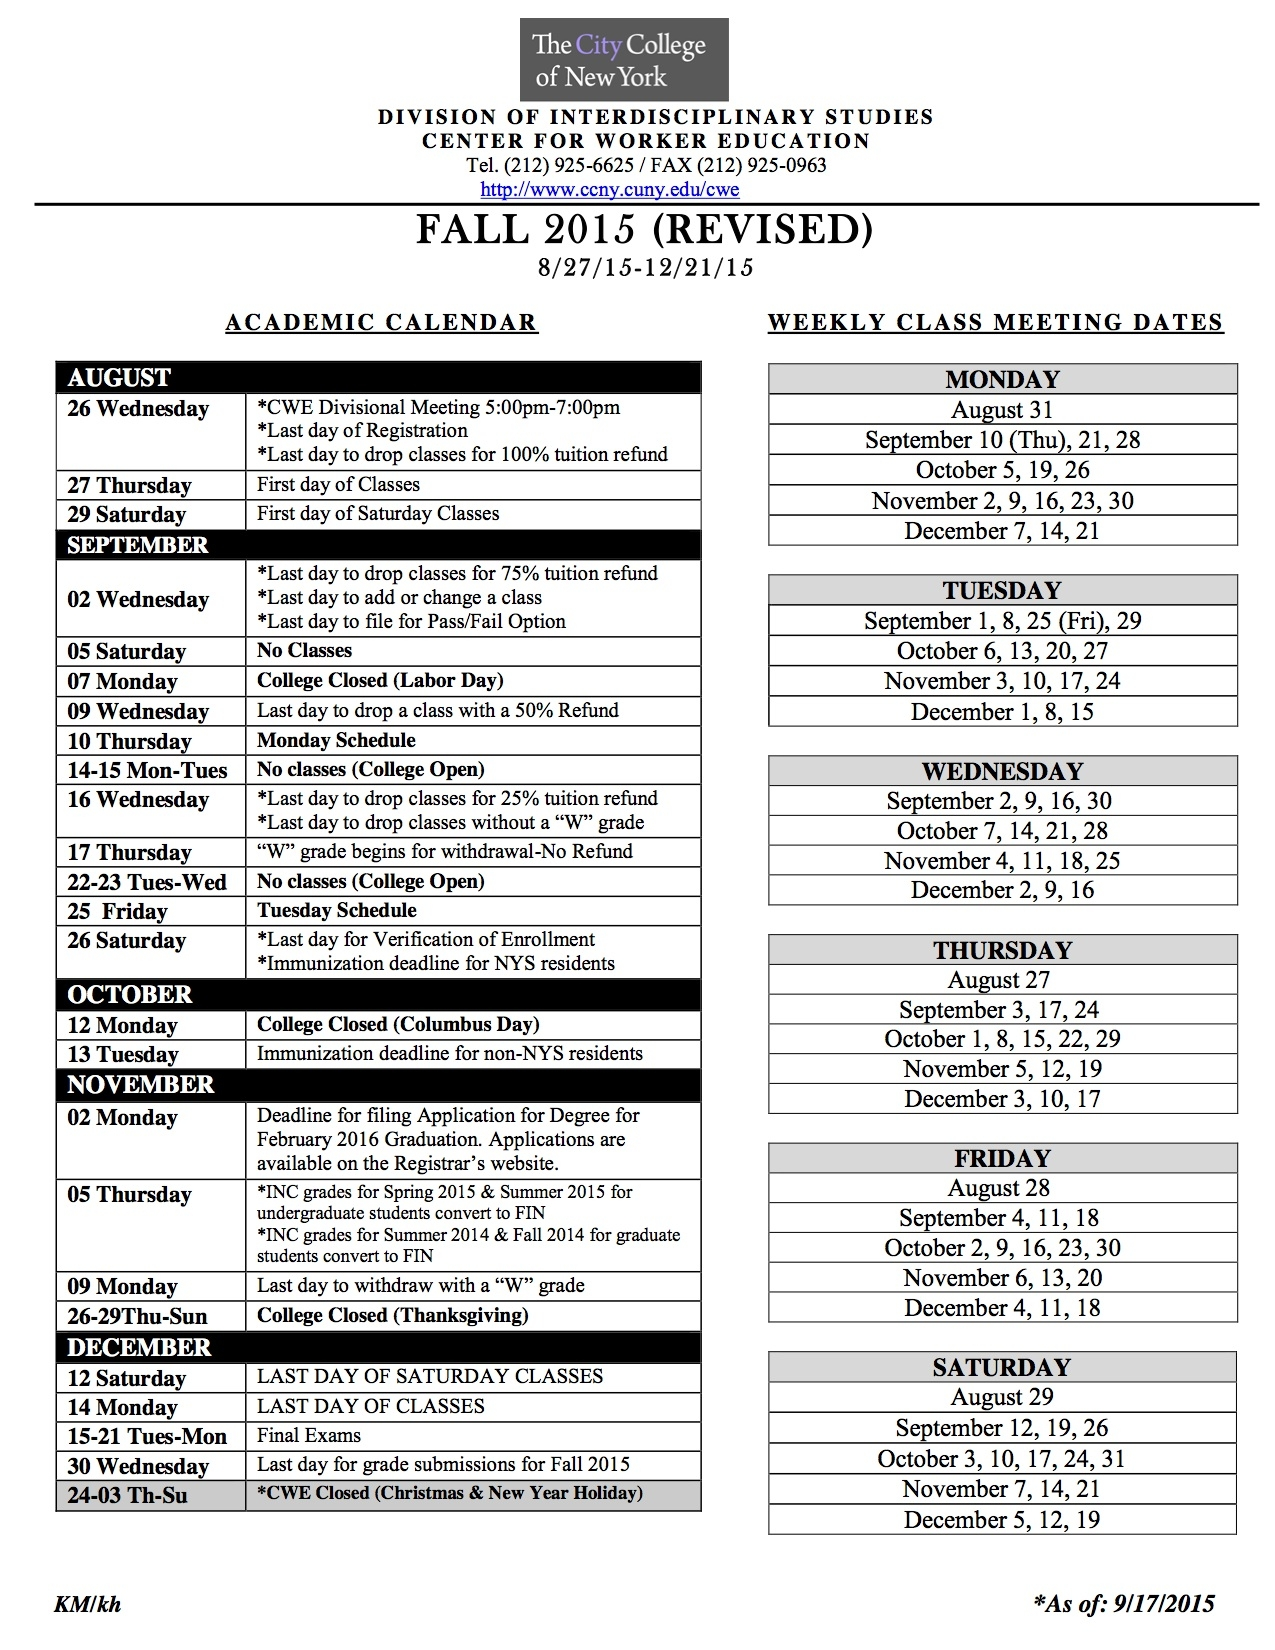 Academic Calendar The City College Of New York